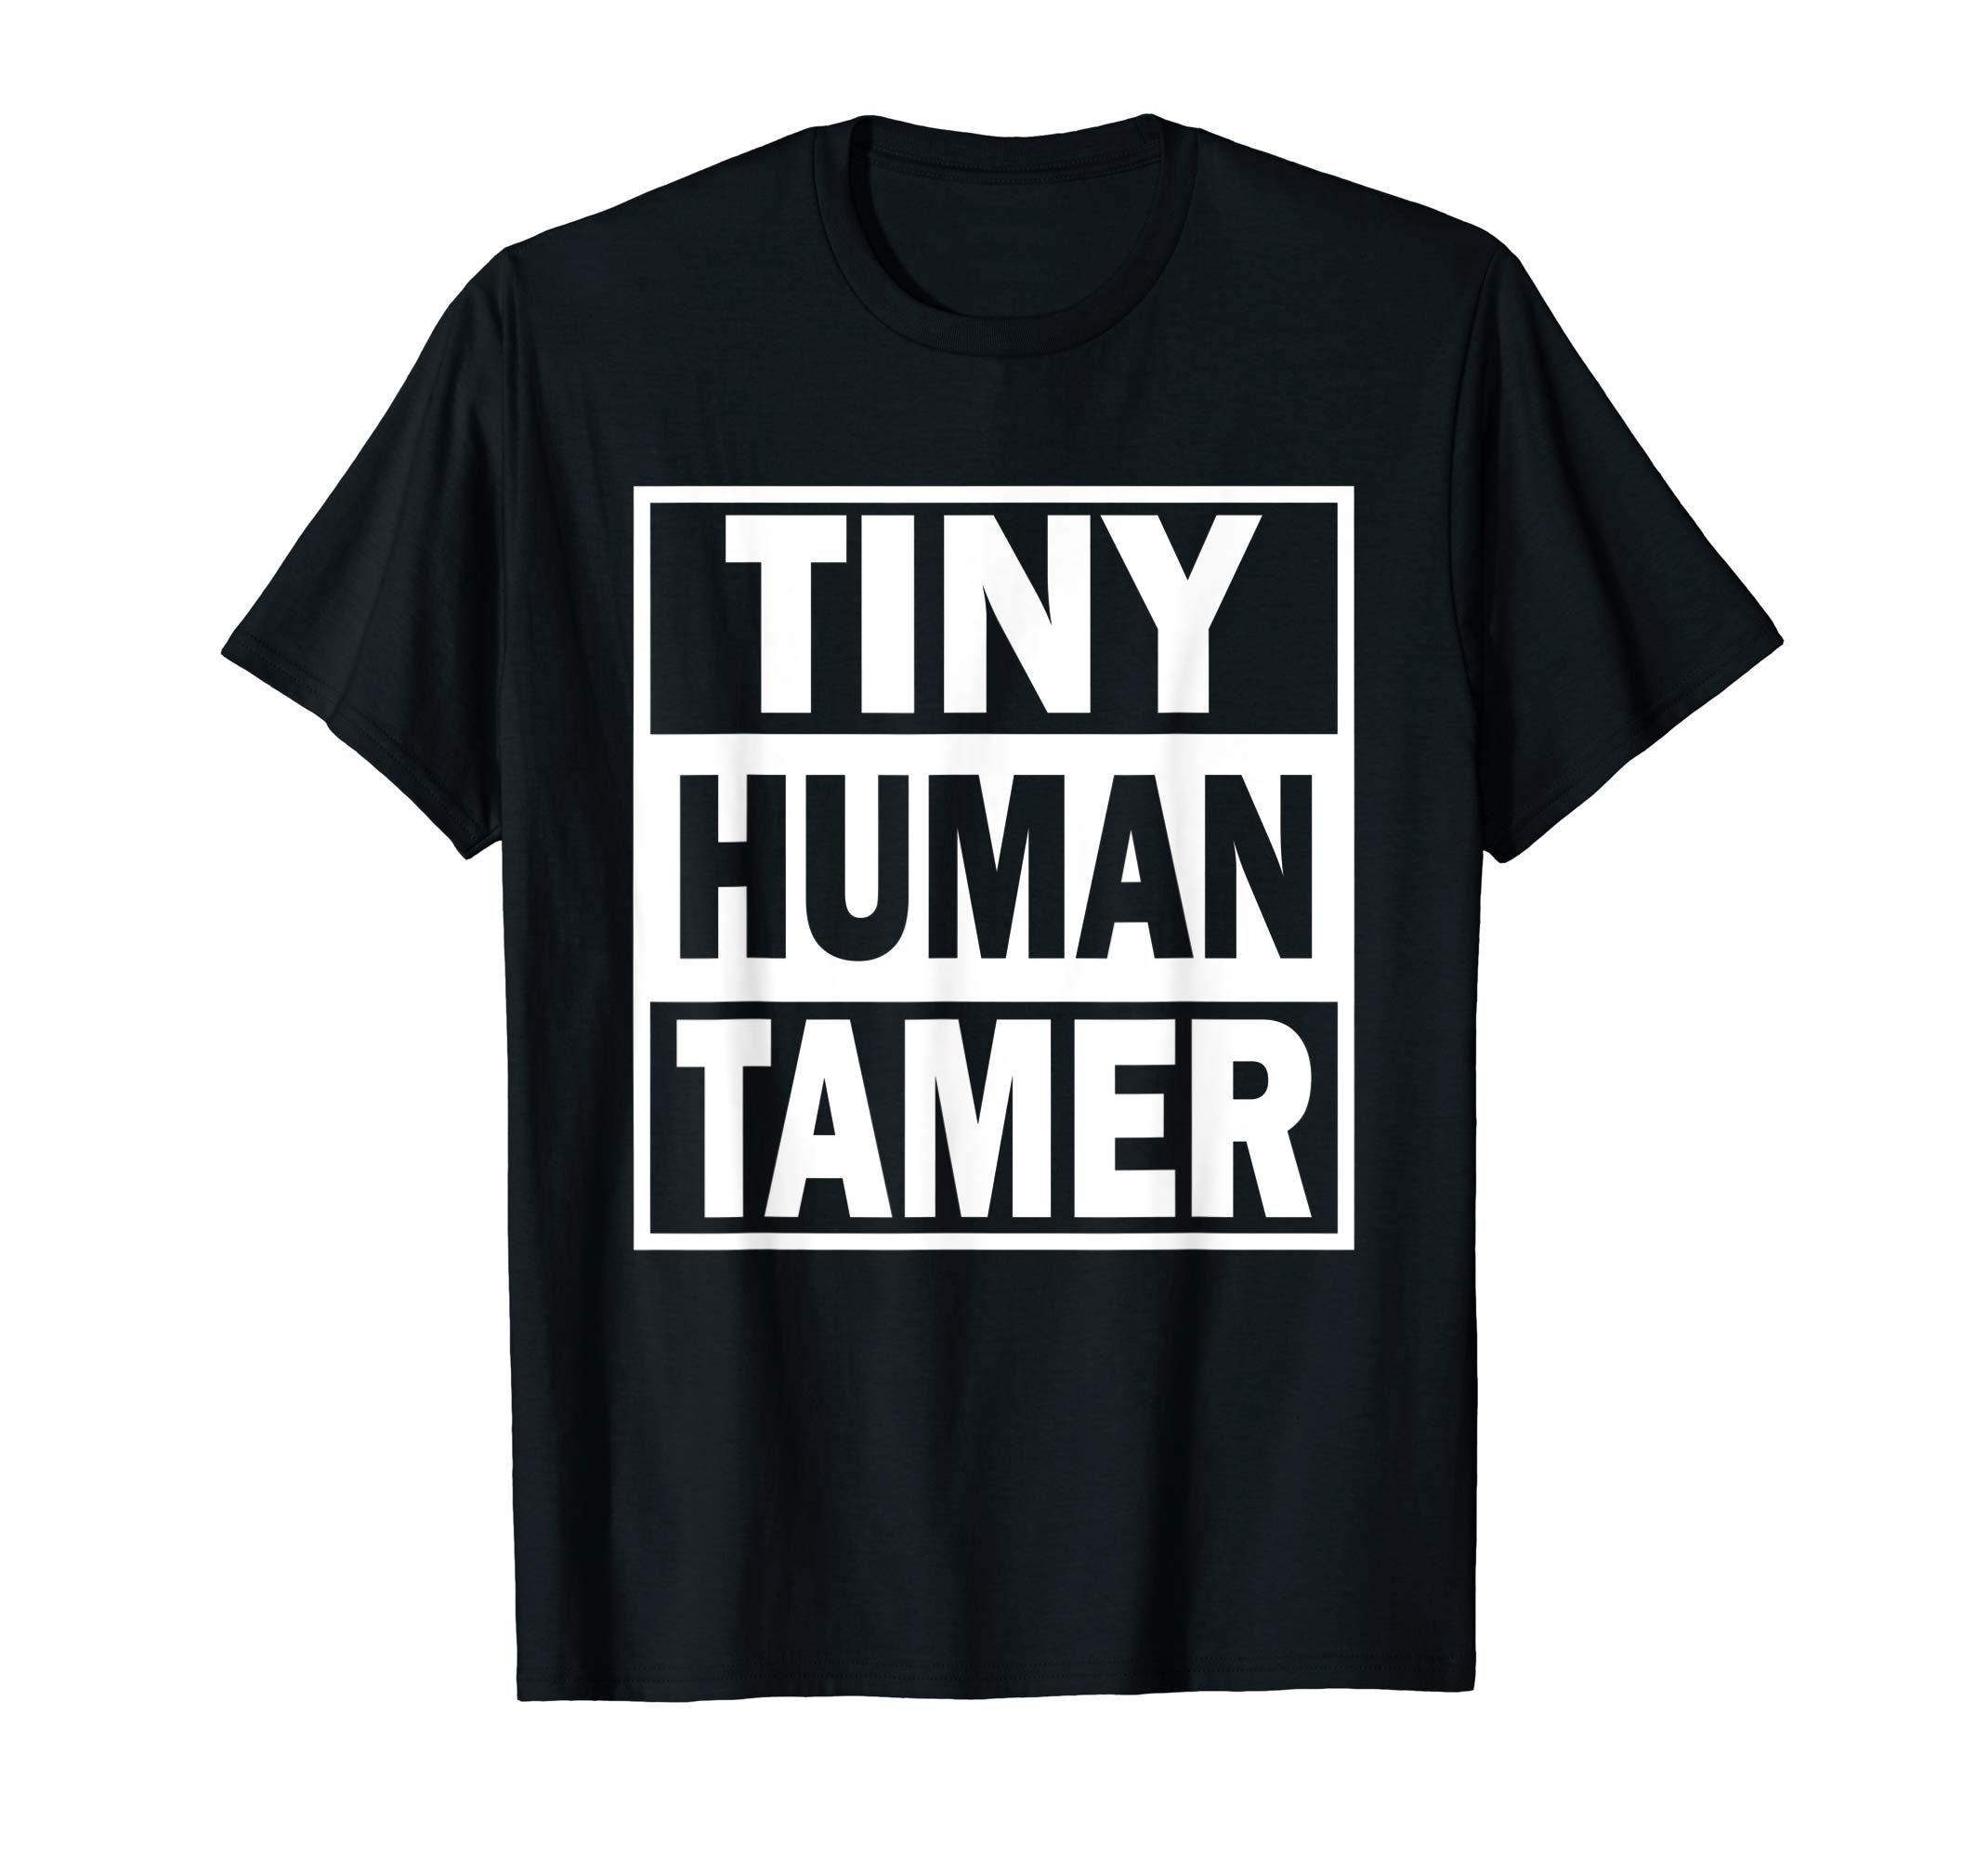 9125b6b05 Tiny Human Tamer Daycare Teacher Appreciation Gift T-Shirt ...